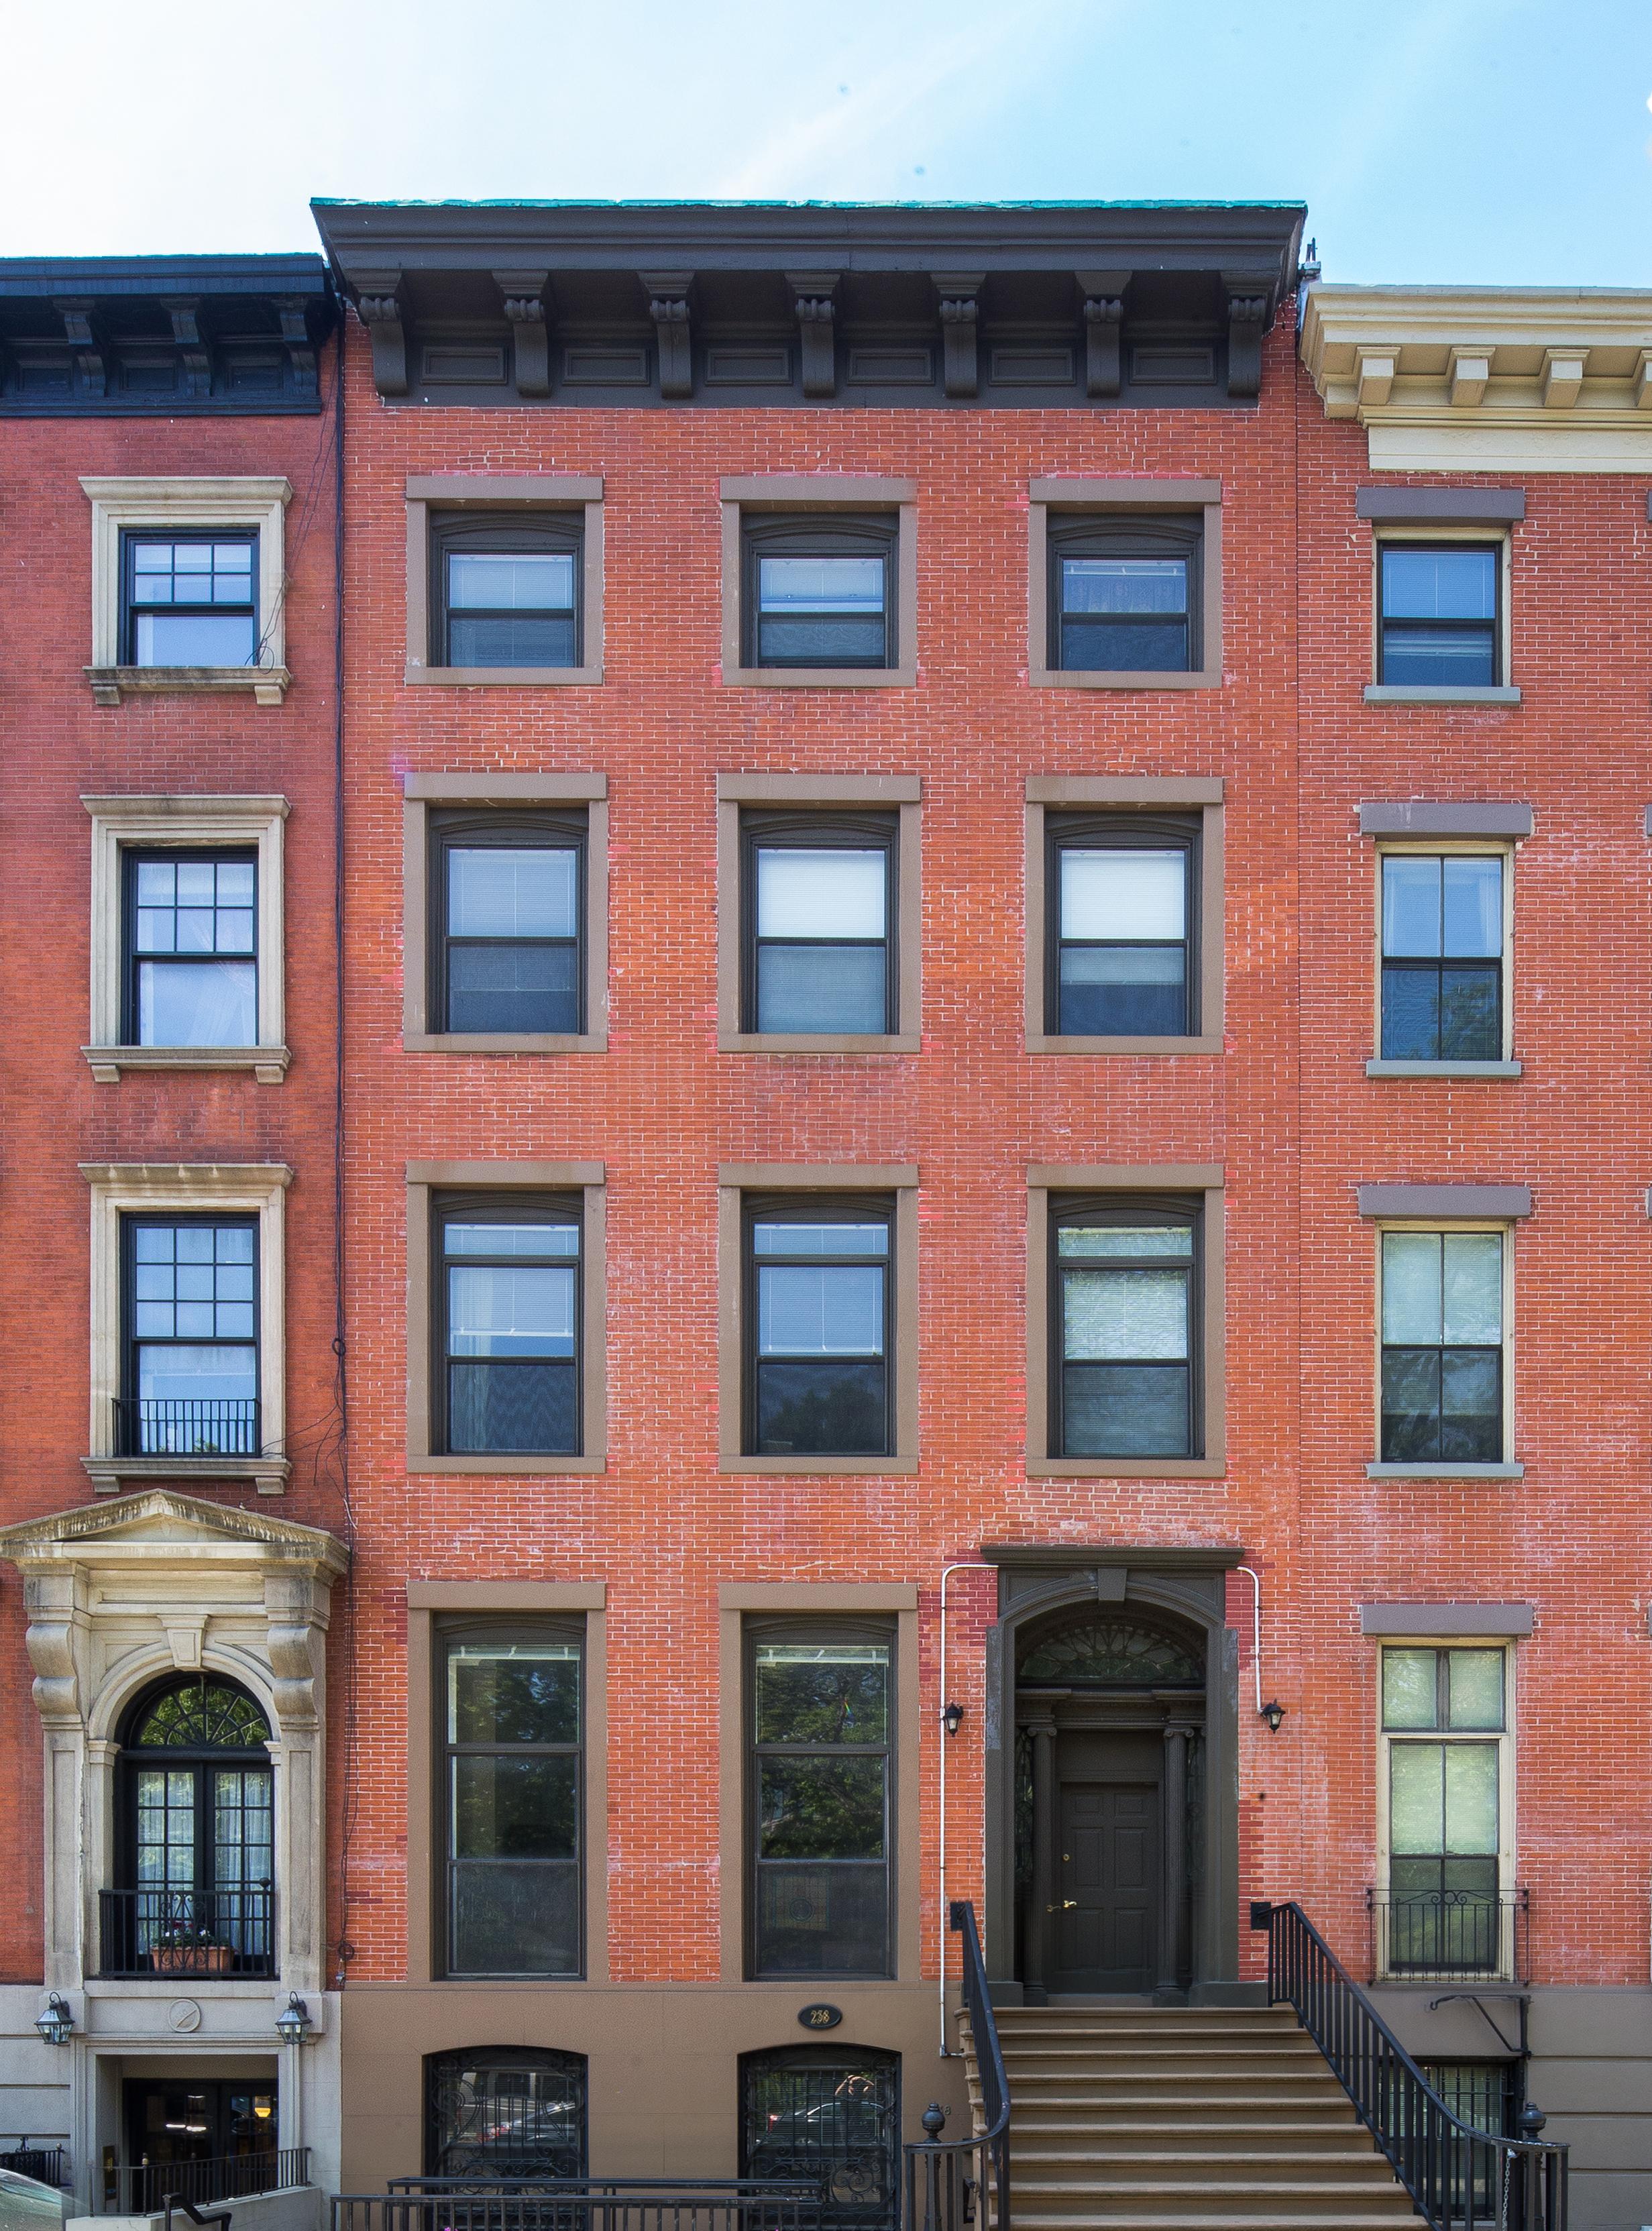 238 East 15th Street - $9,995,000